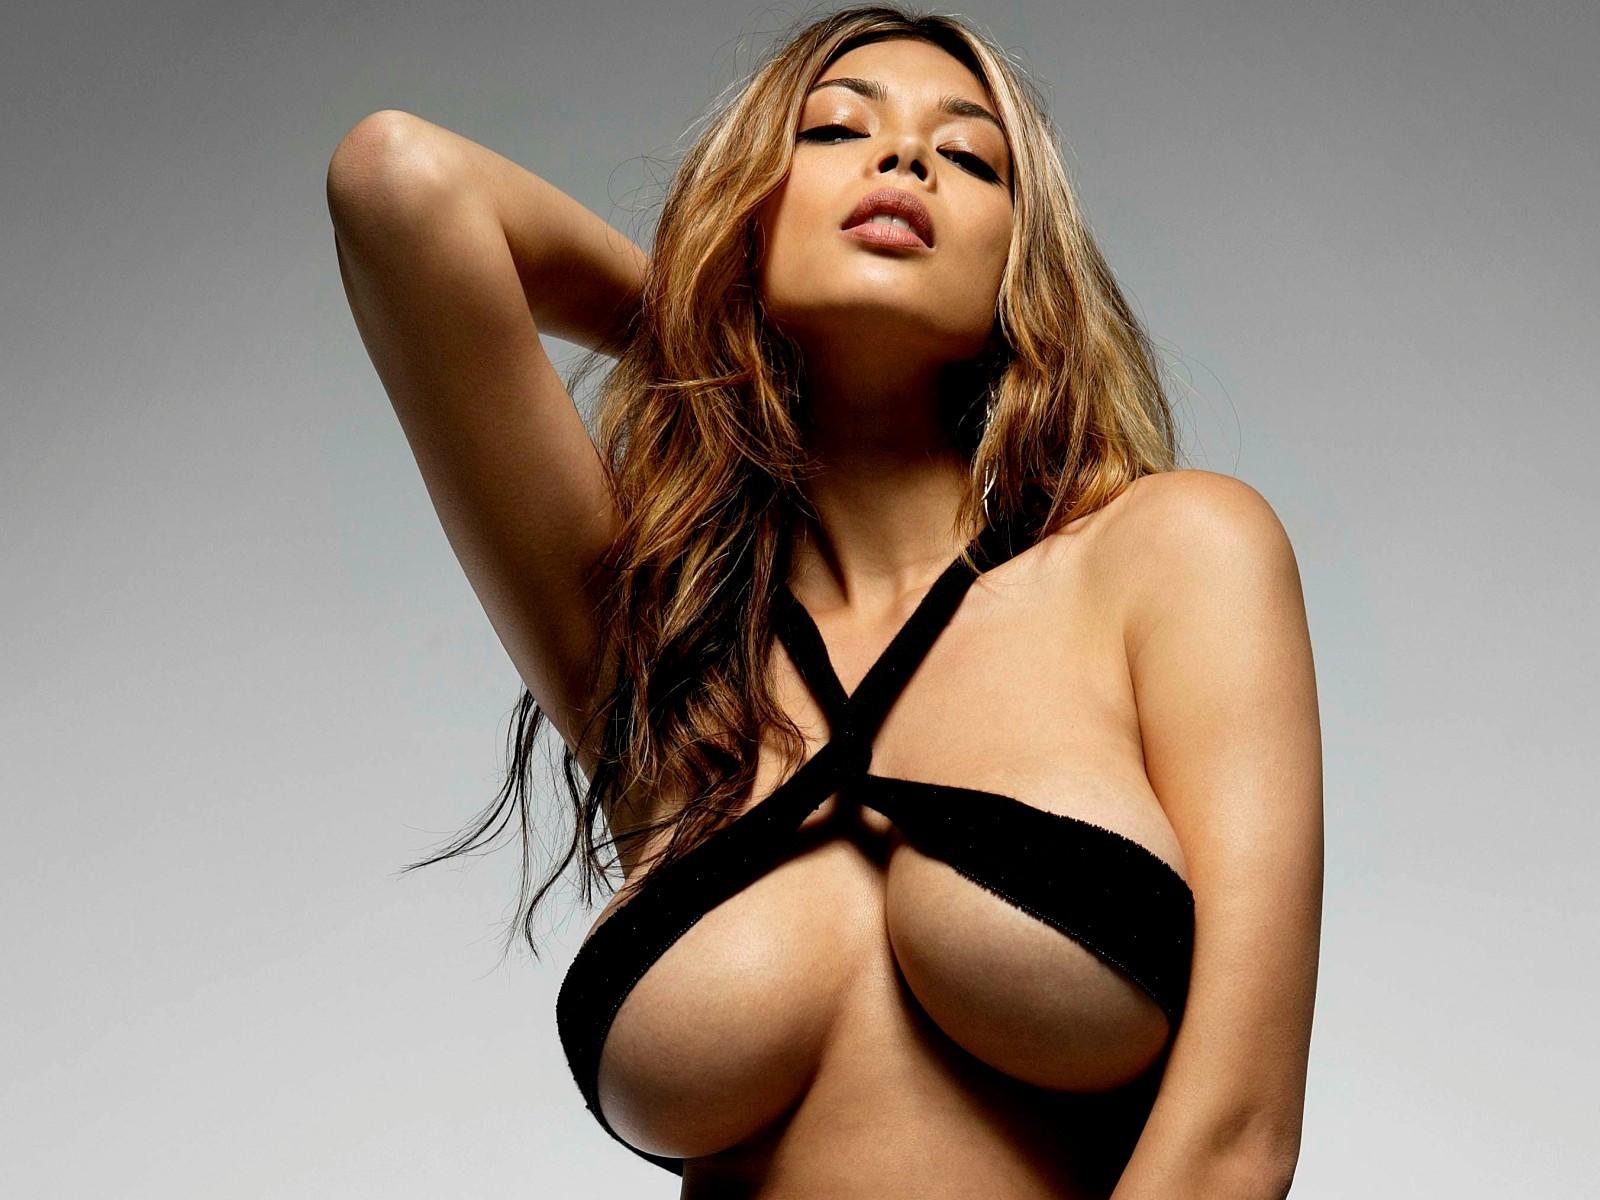 Hongkong hot sex women com